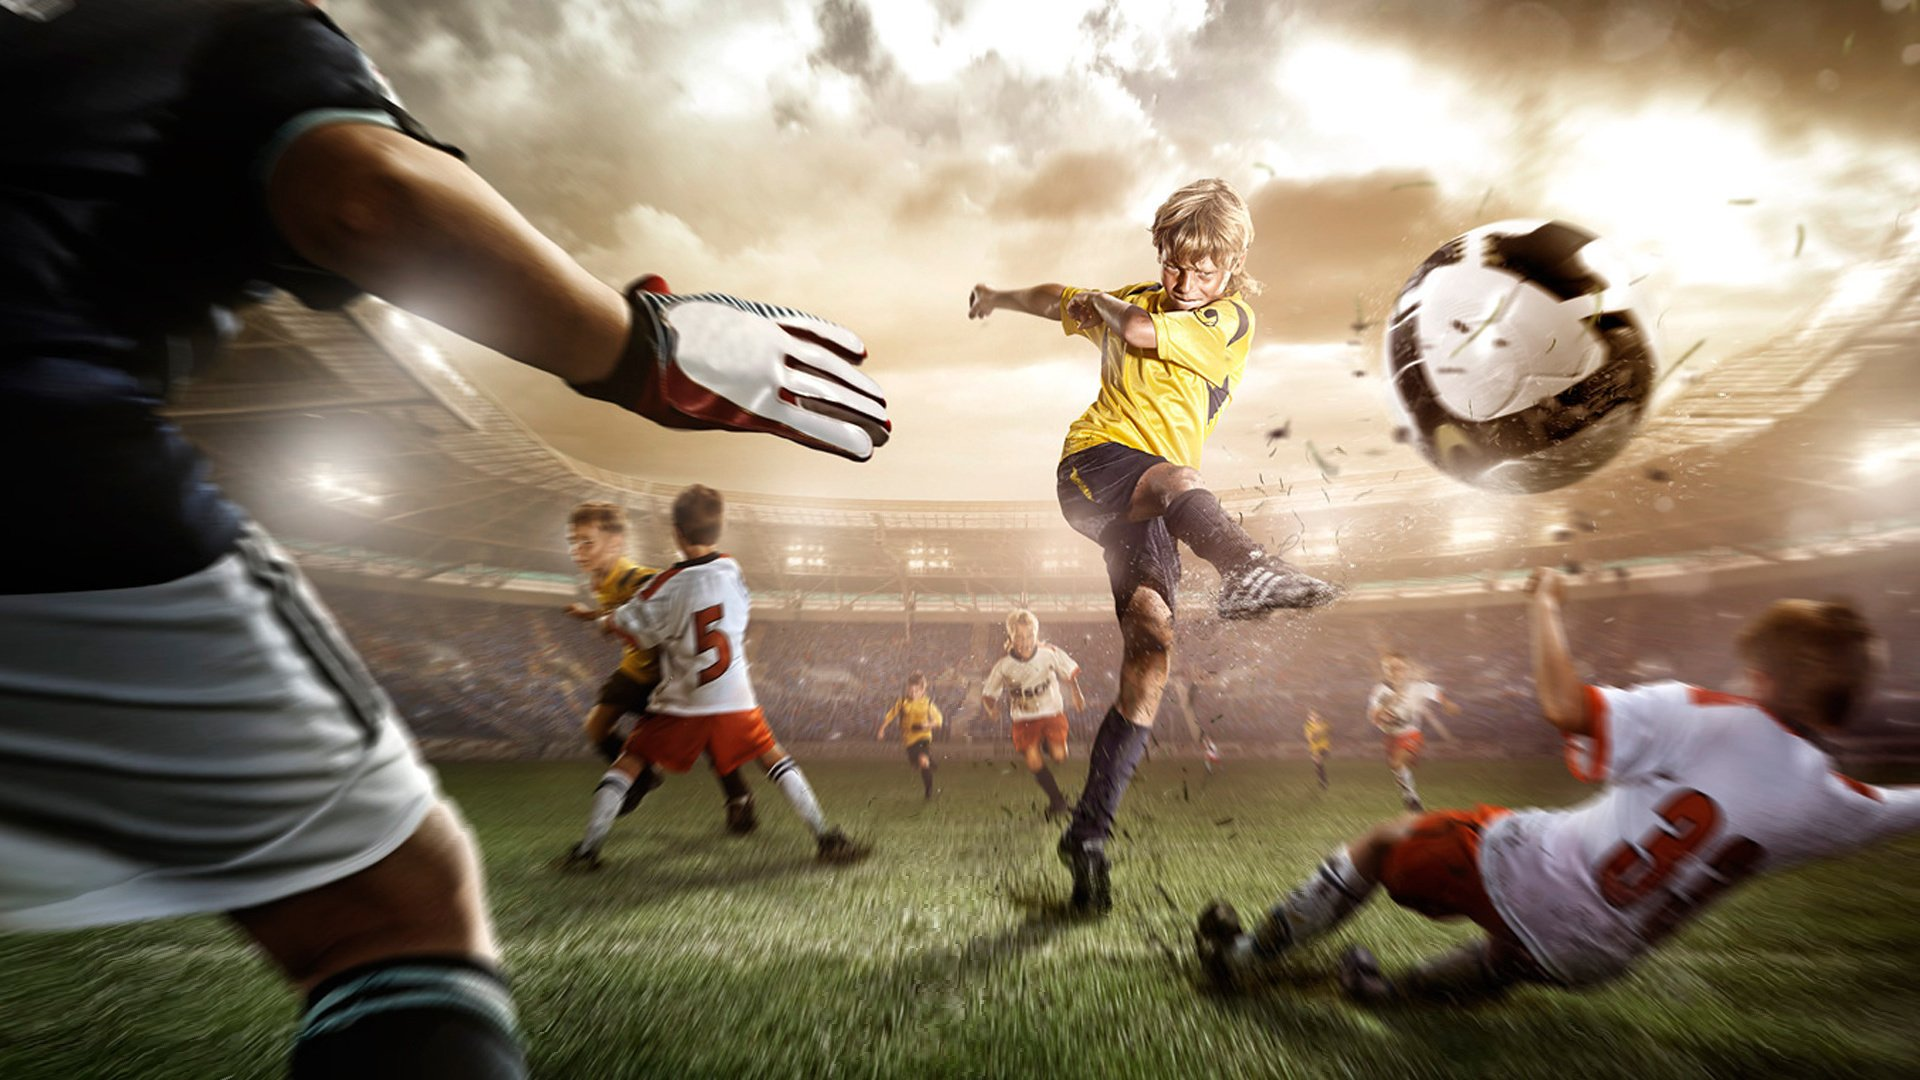 Крутые картинки футбола, день кошек